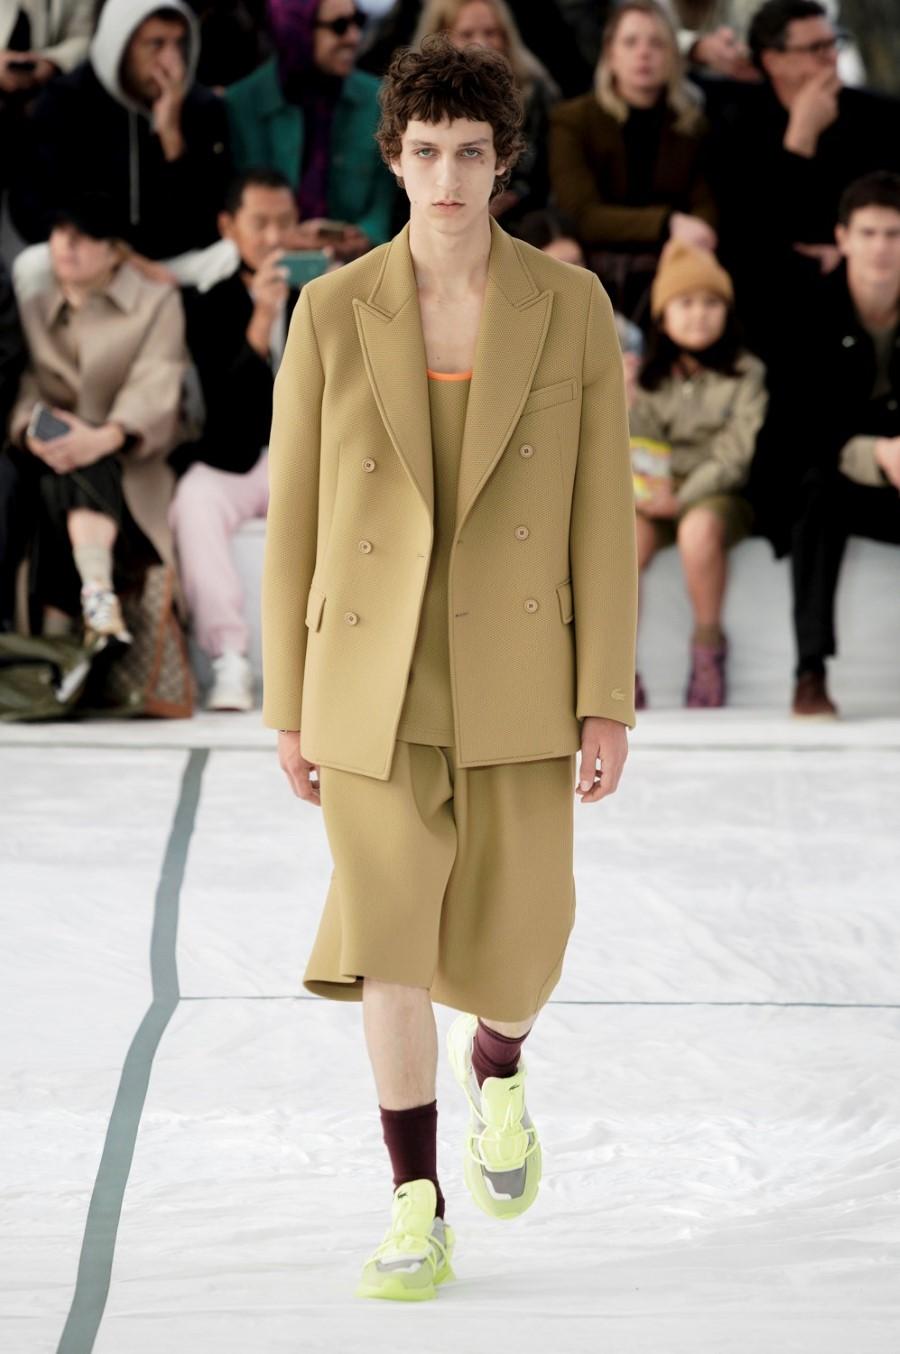 Lacoste Spring Summer 2022 - Paris Fashion Week